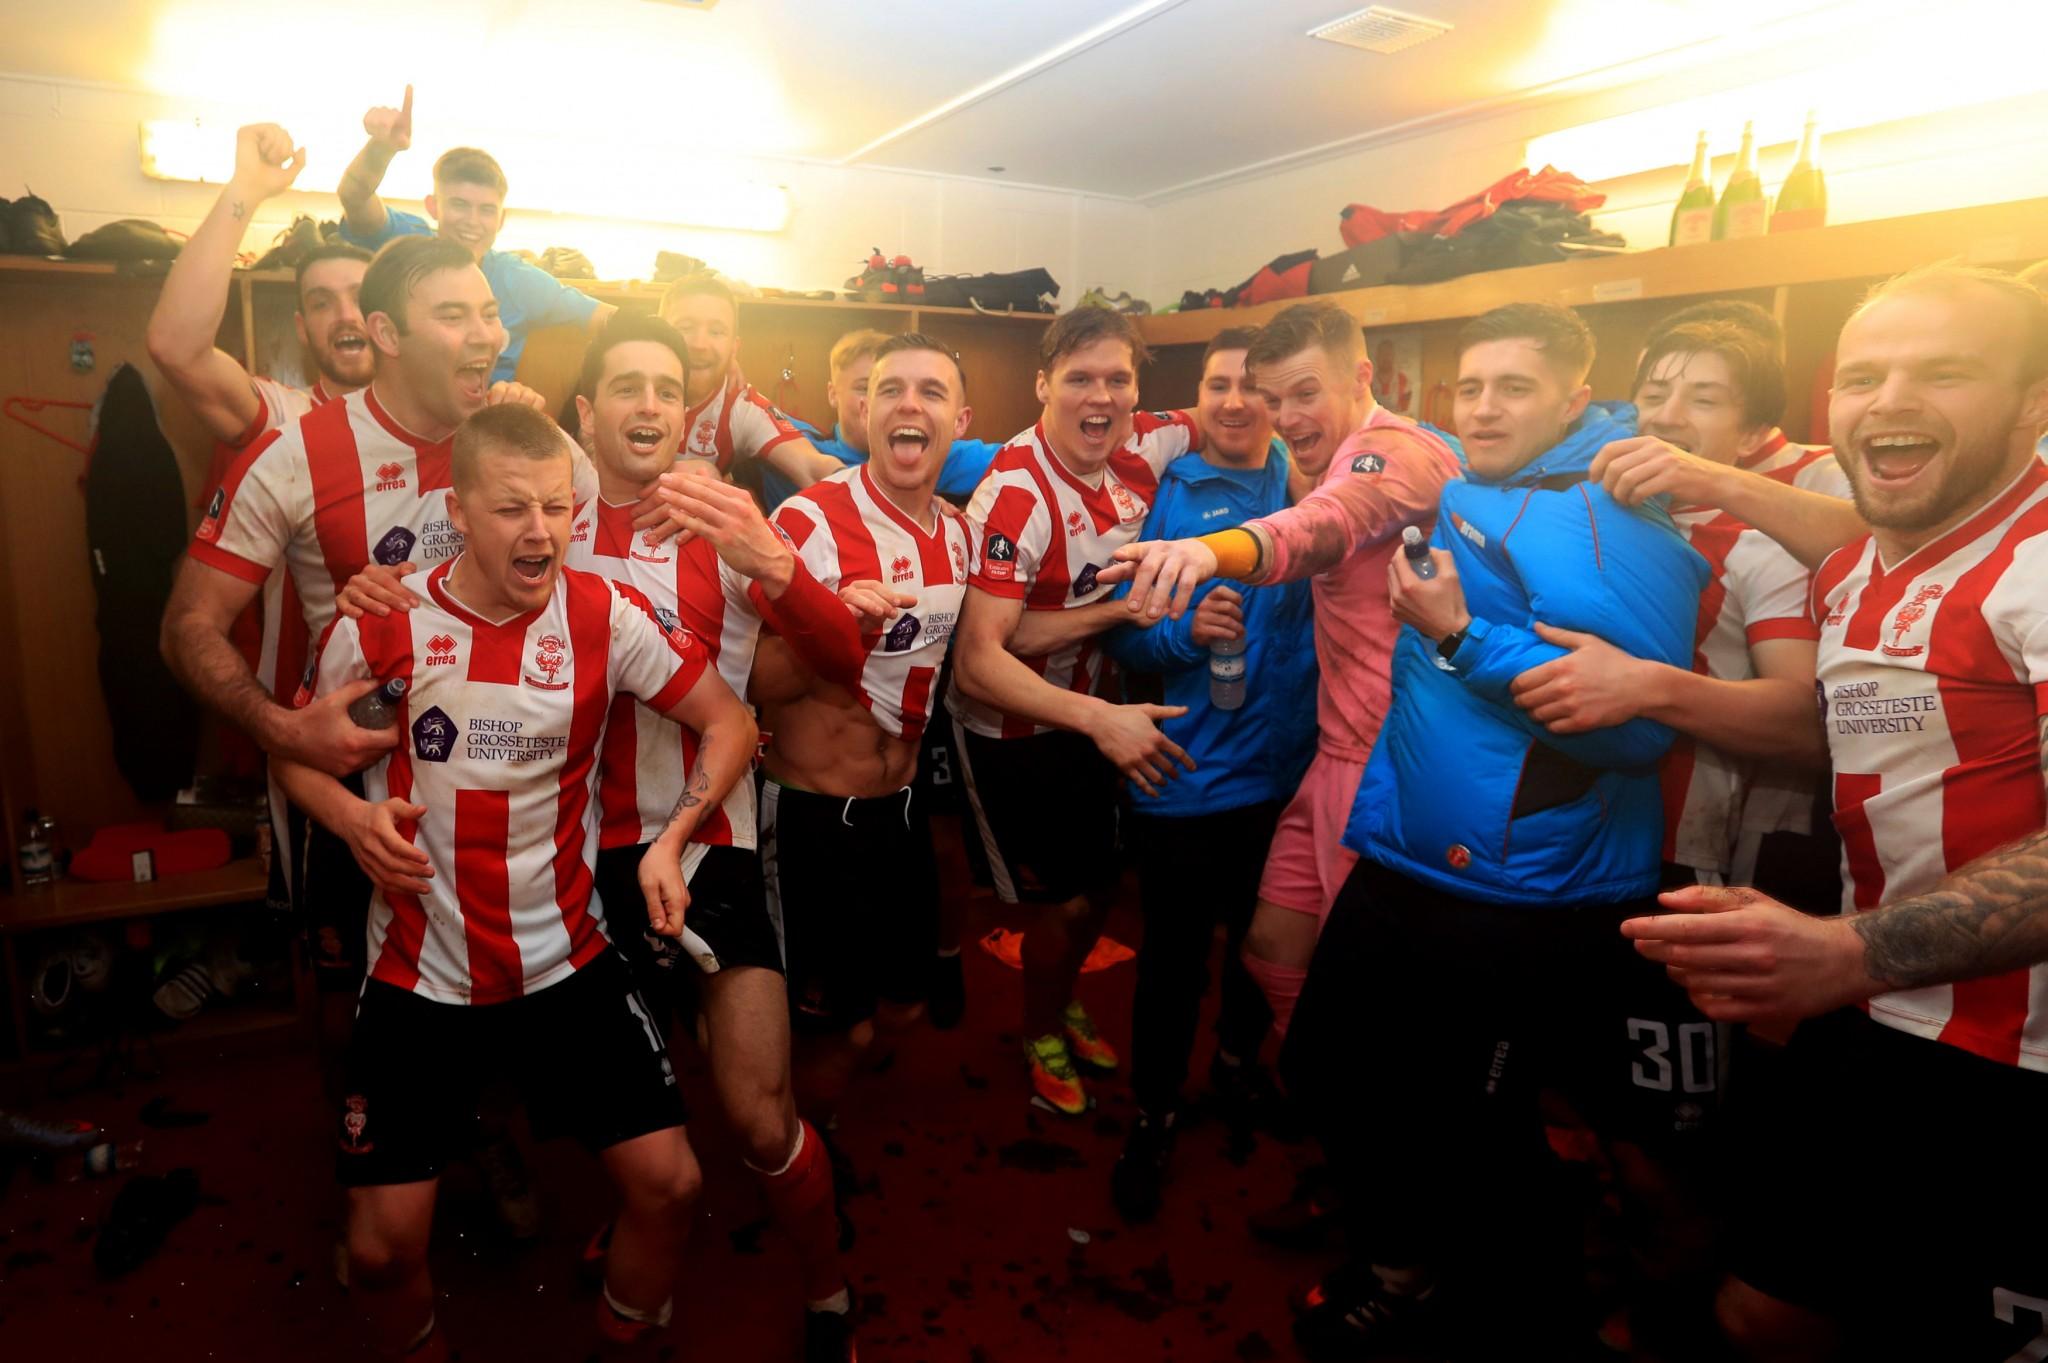 Lincoln celebrate their round 4 defeat of Brighton